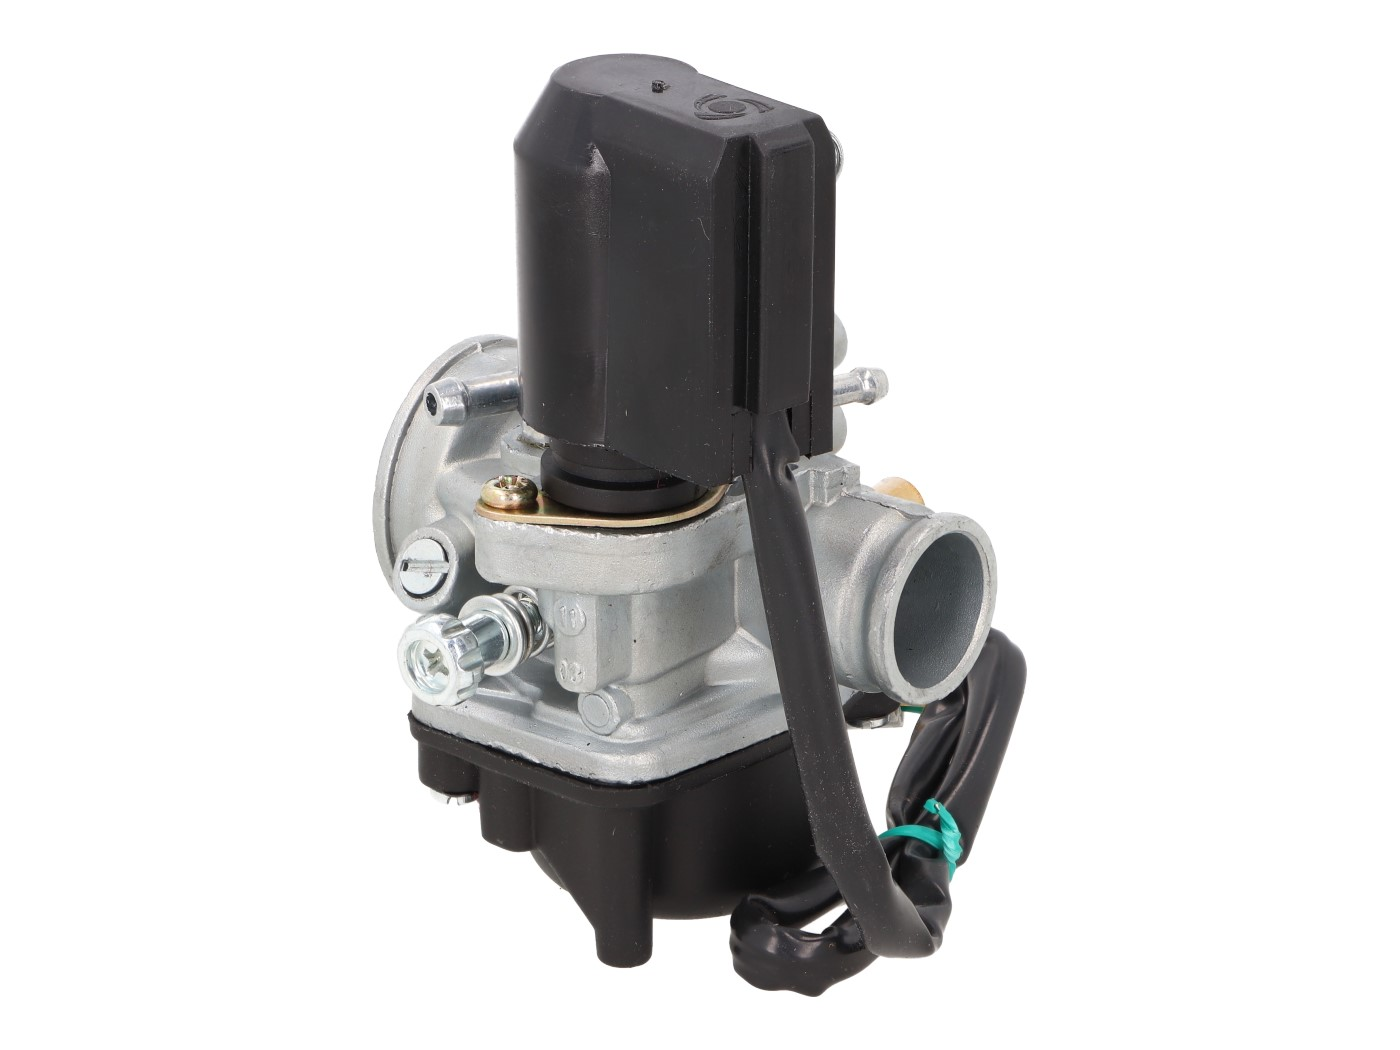 Carburetor Naraku 175mm Electric Choke For Piaggio Keeway Cpi Hand Sealer Sj0052 Back